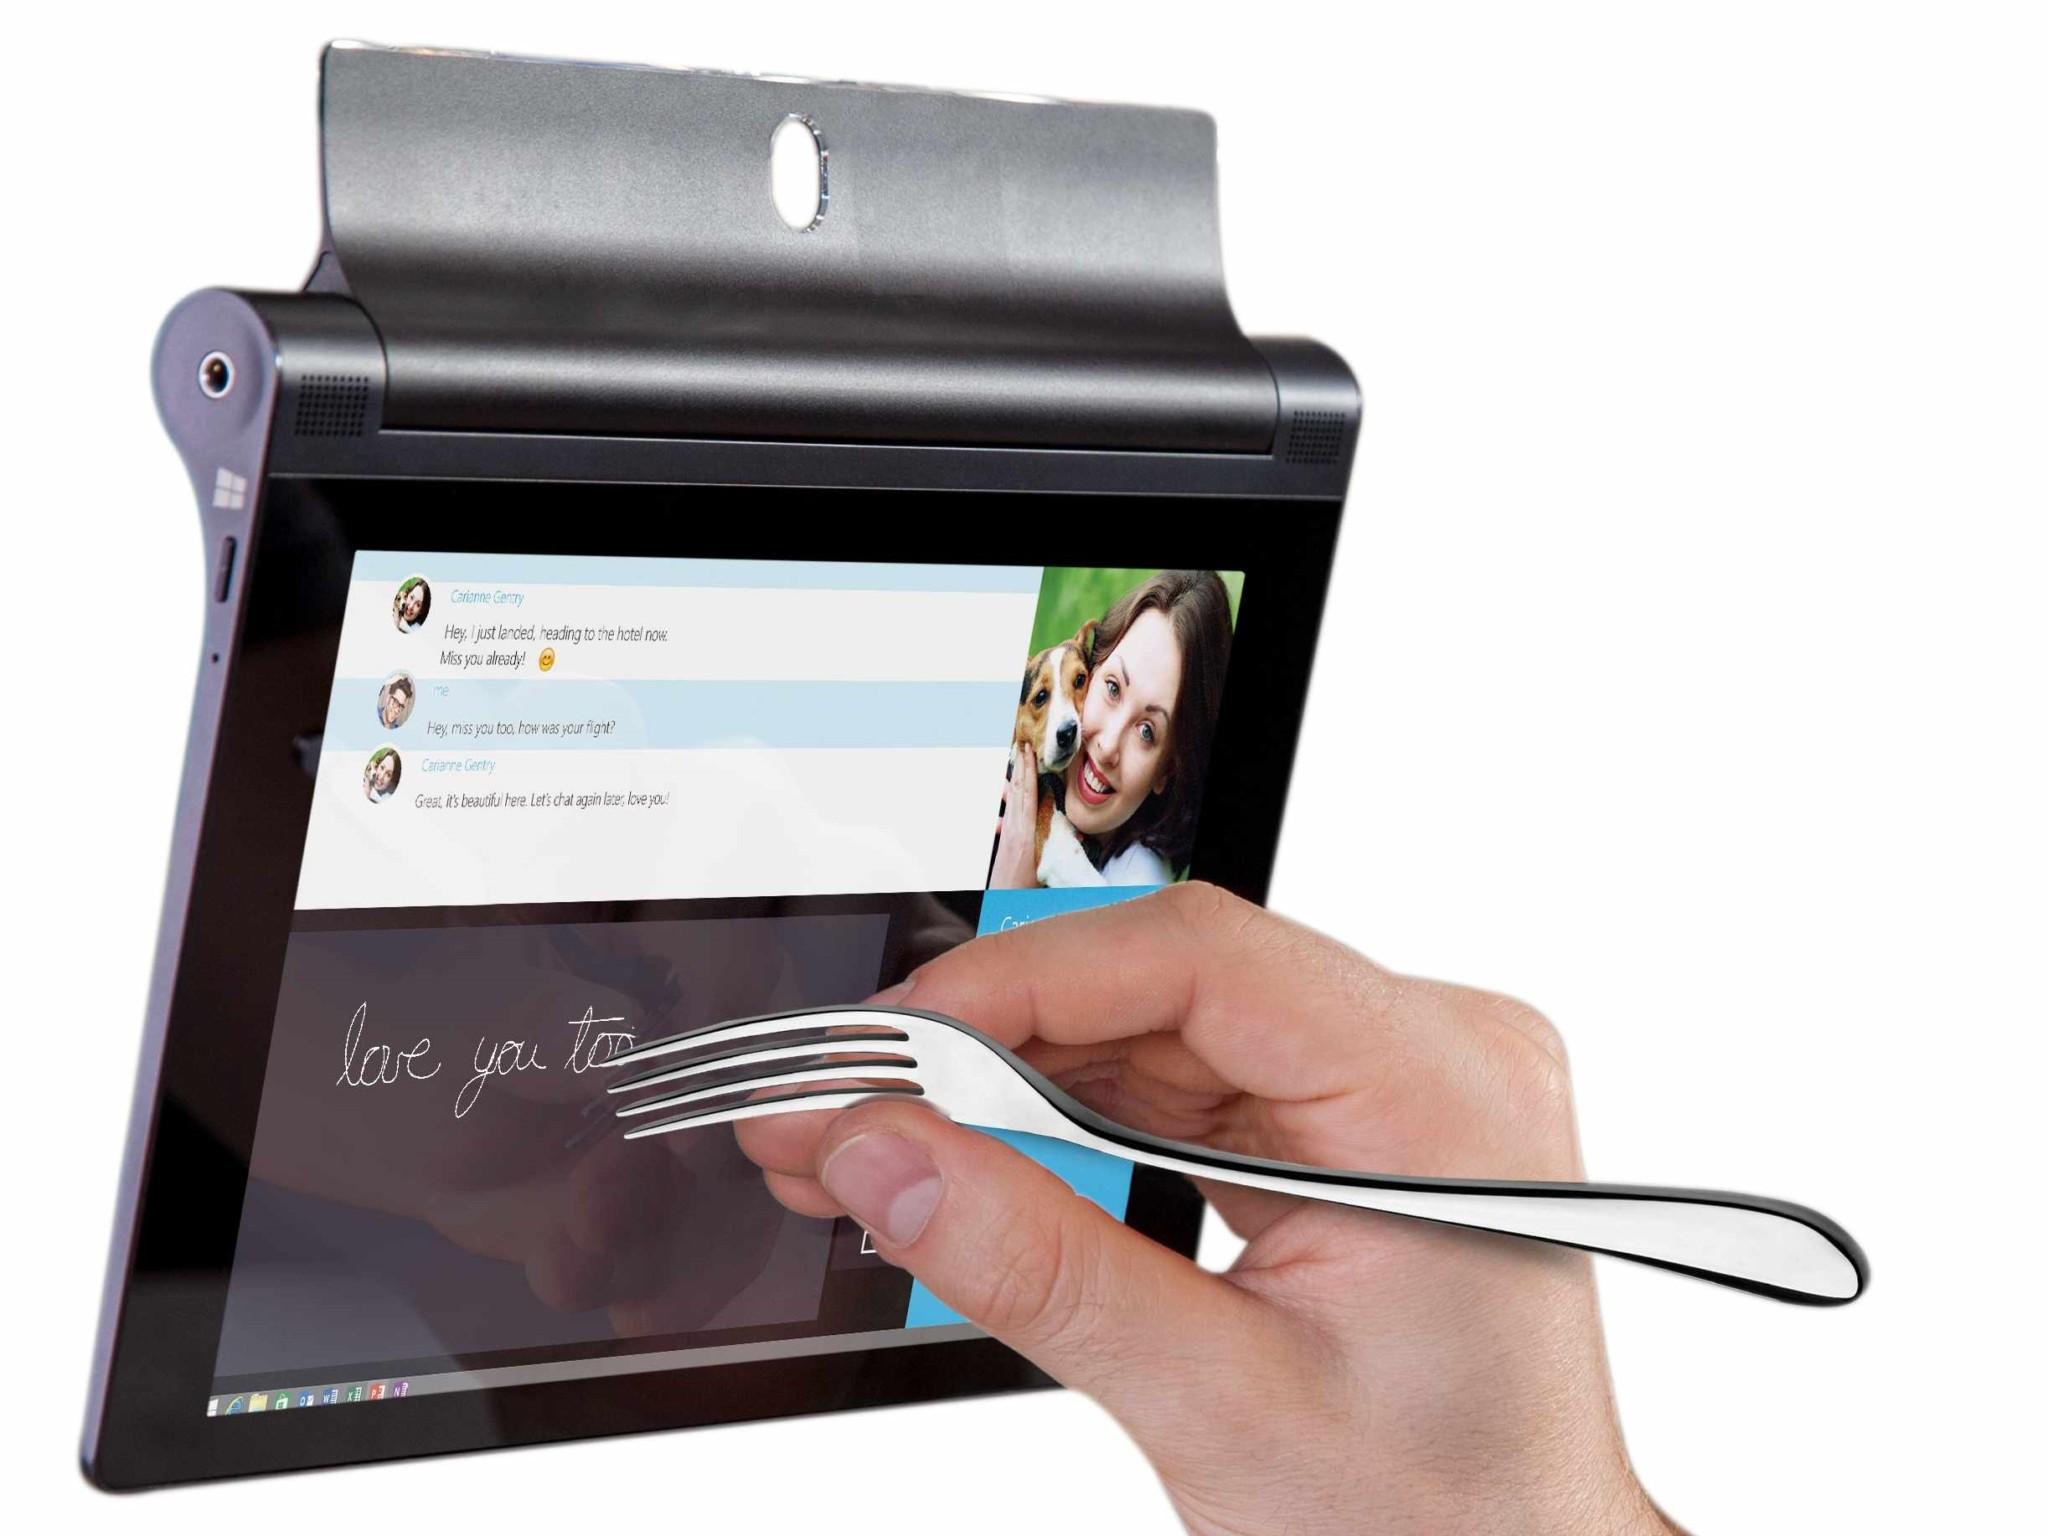 Lenovo Yoga Tablet 2 8 Windows lze ovládat třeba i vidličkou